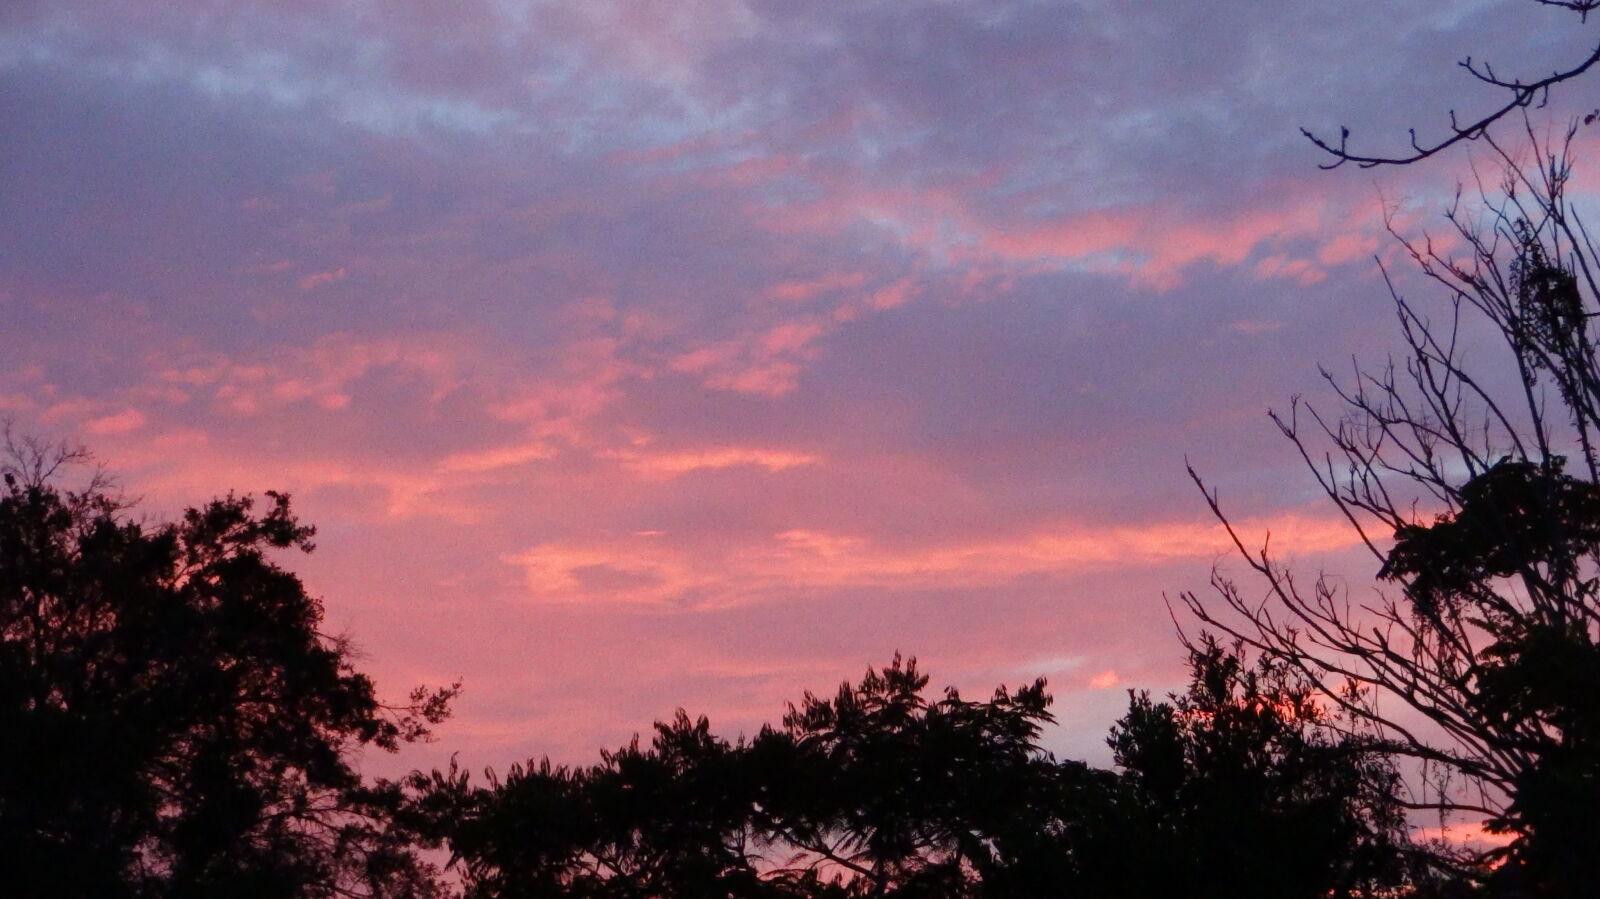 evening, evening, sky